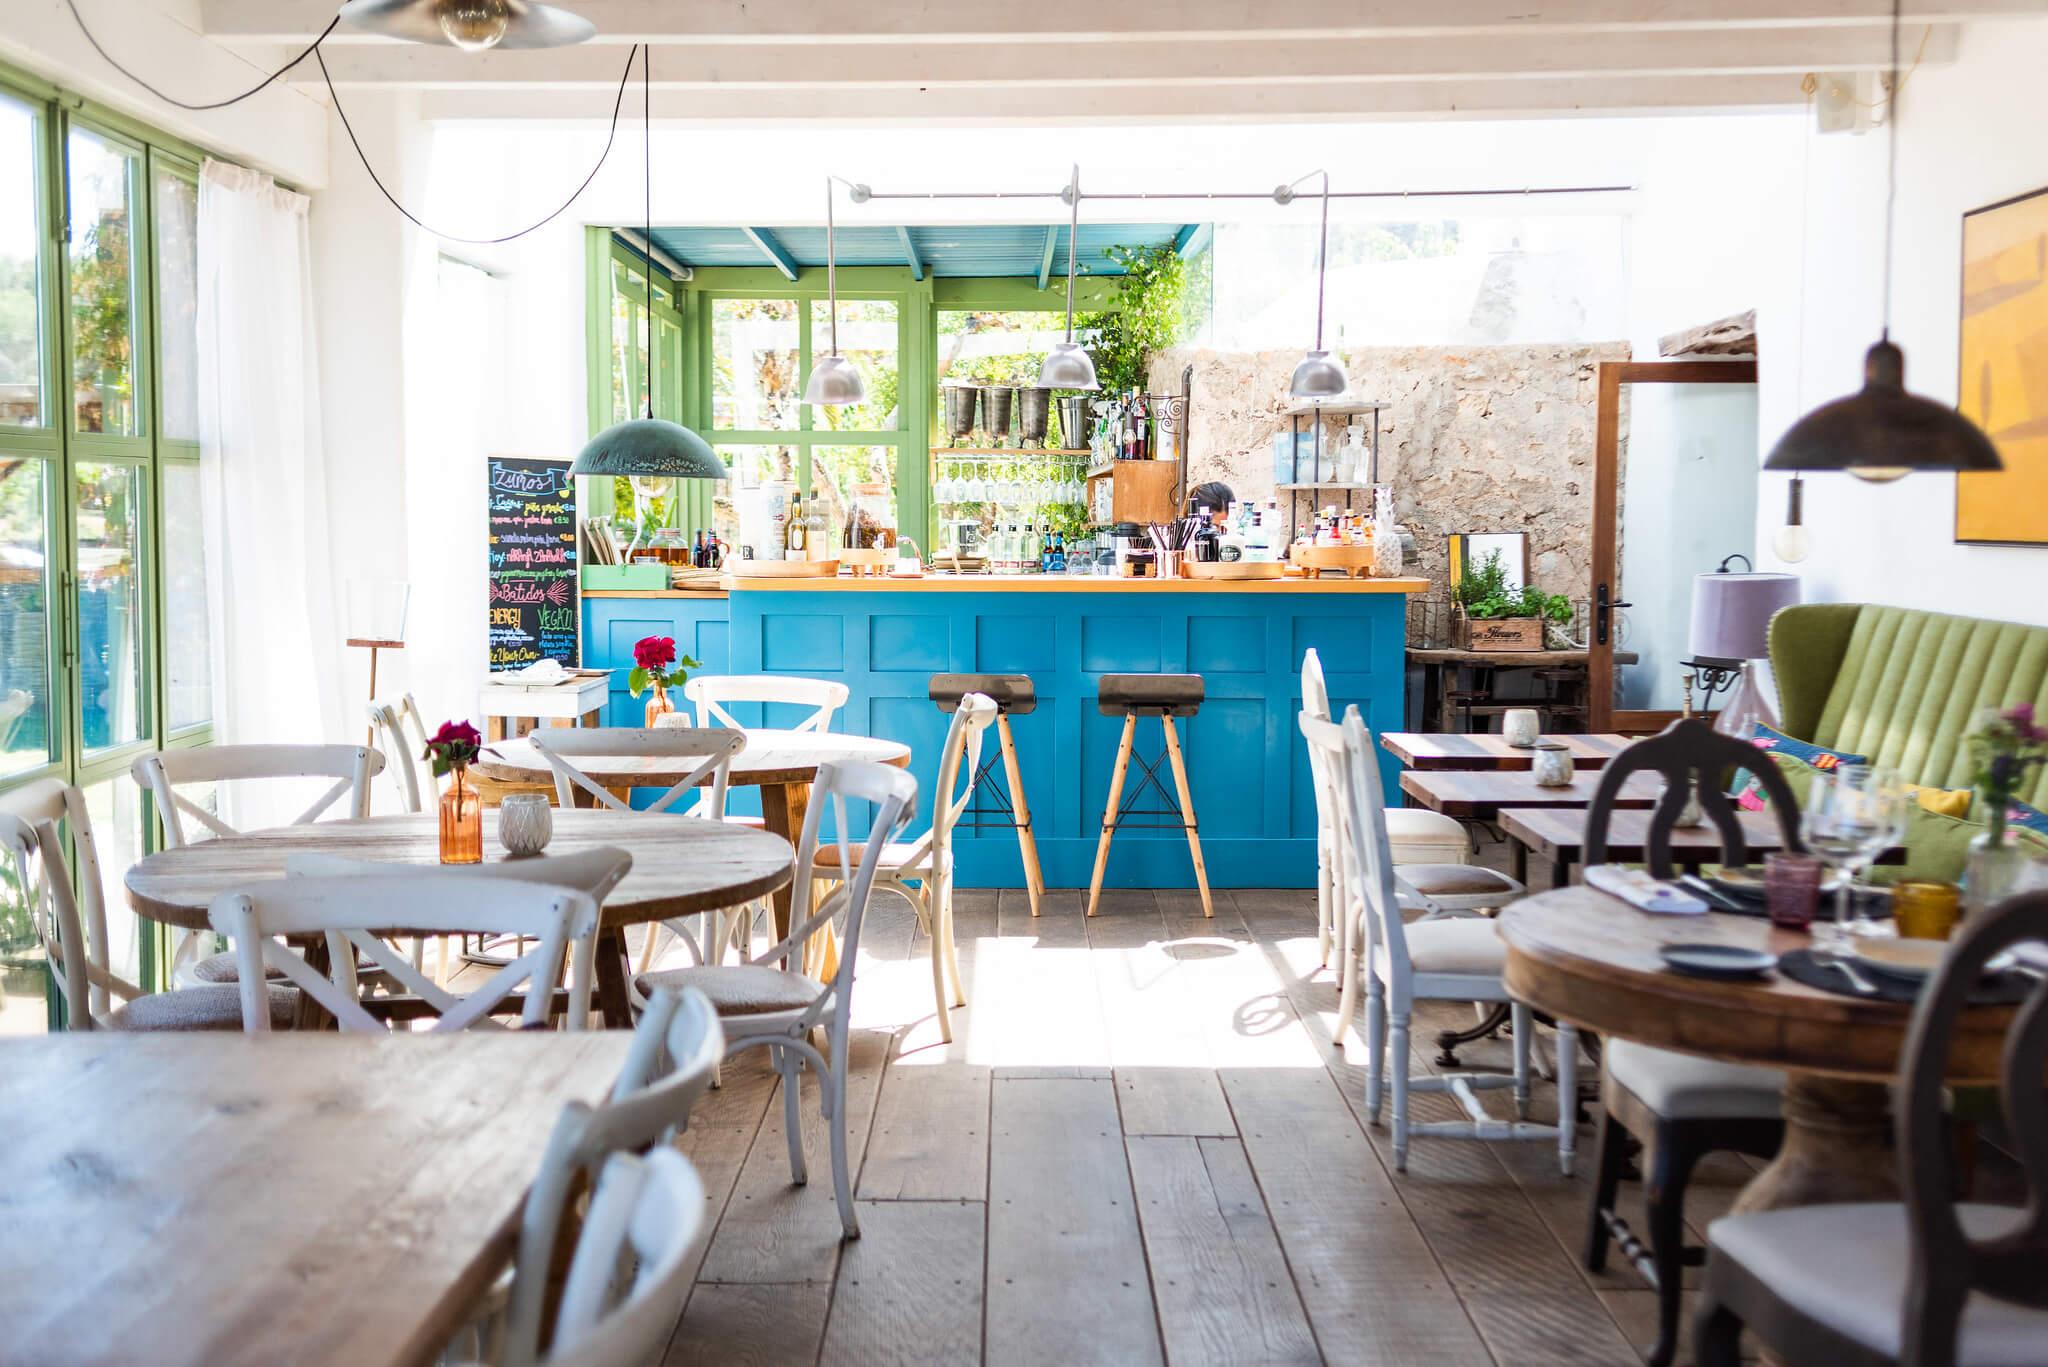 https://www.white-ibiza.com/wp-content/uploads/2020/03/white-ibiza-restaurants-es-cucons-05.jpg